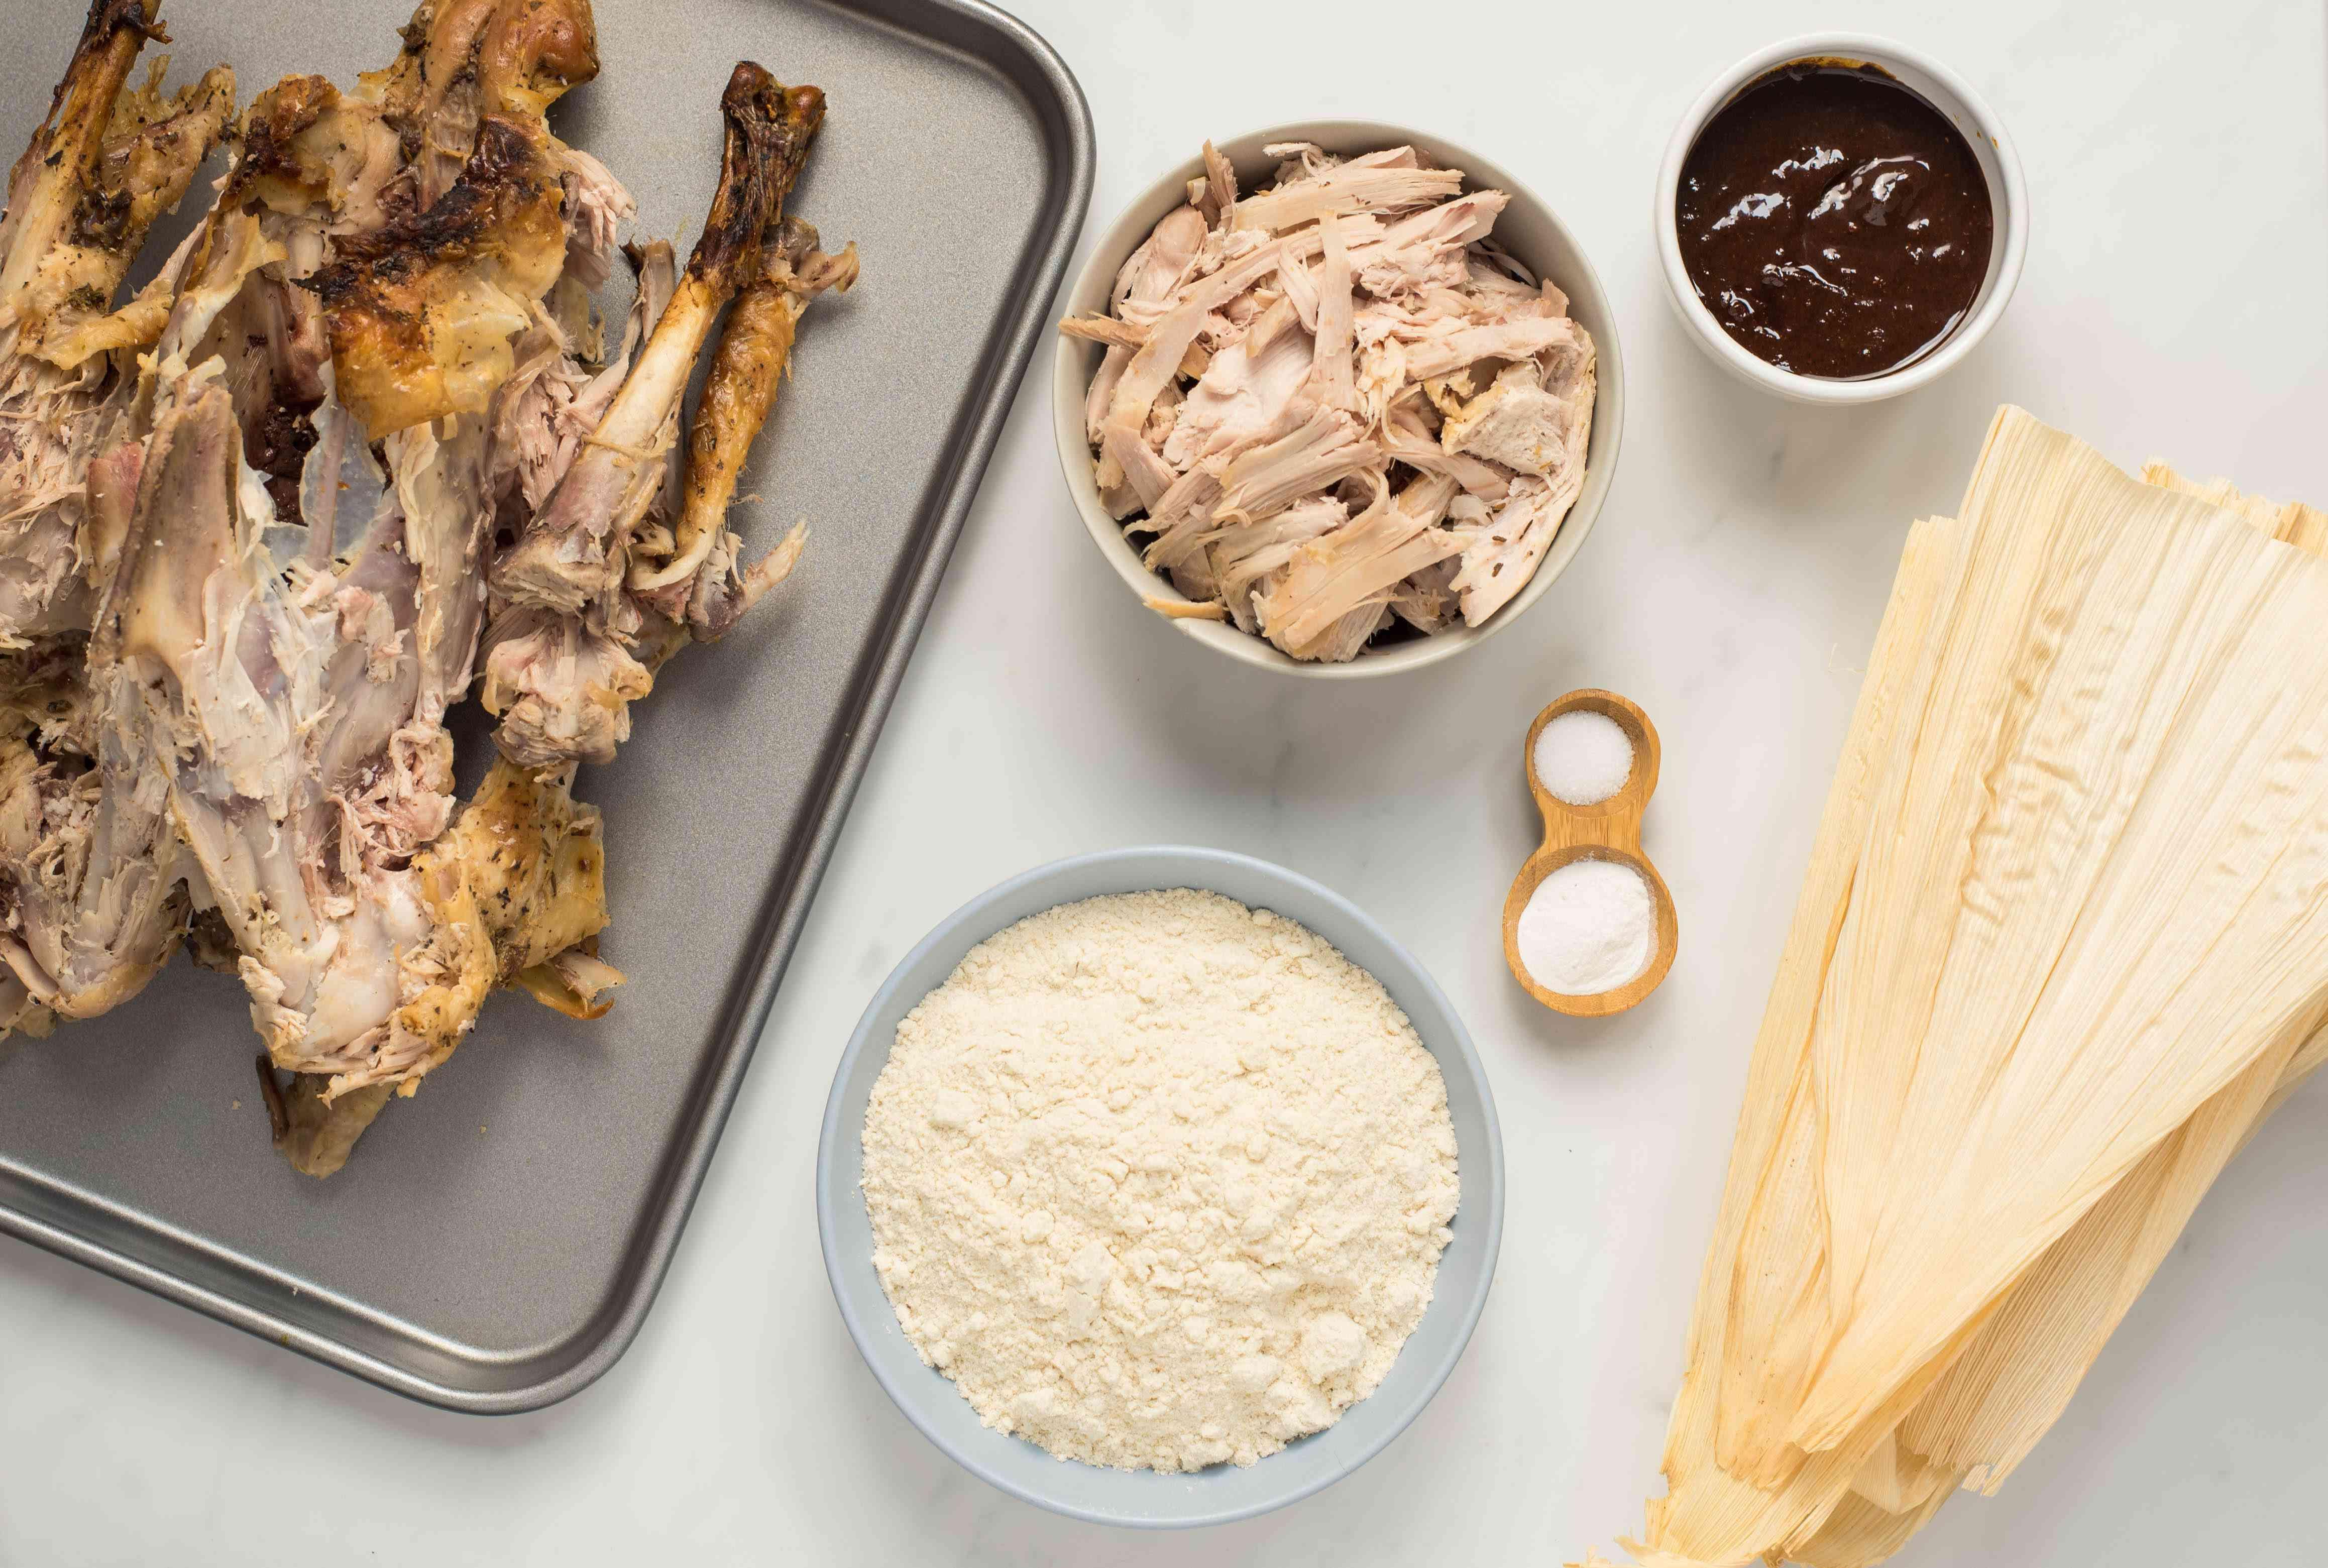 Ingredients for turkey tamales